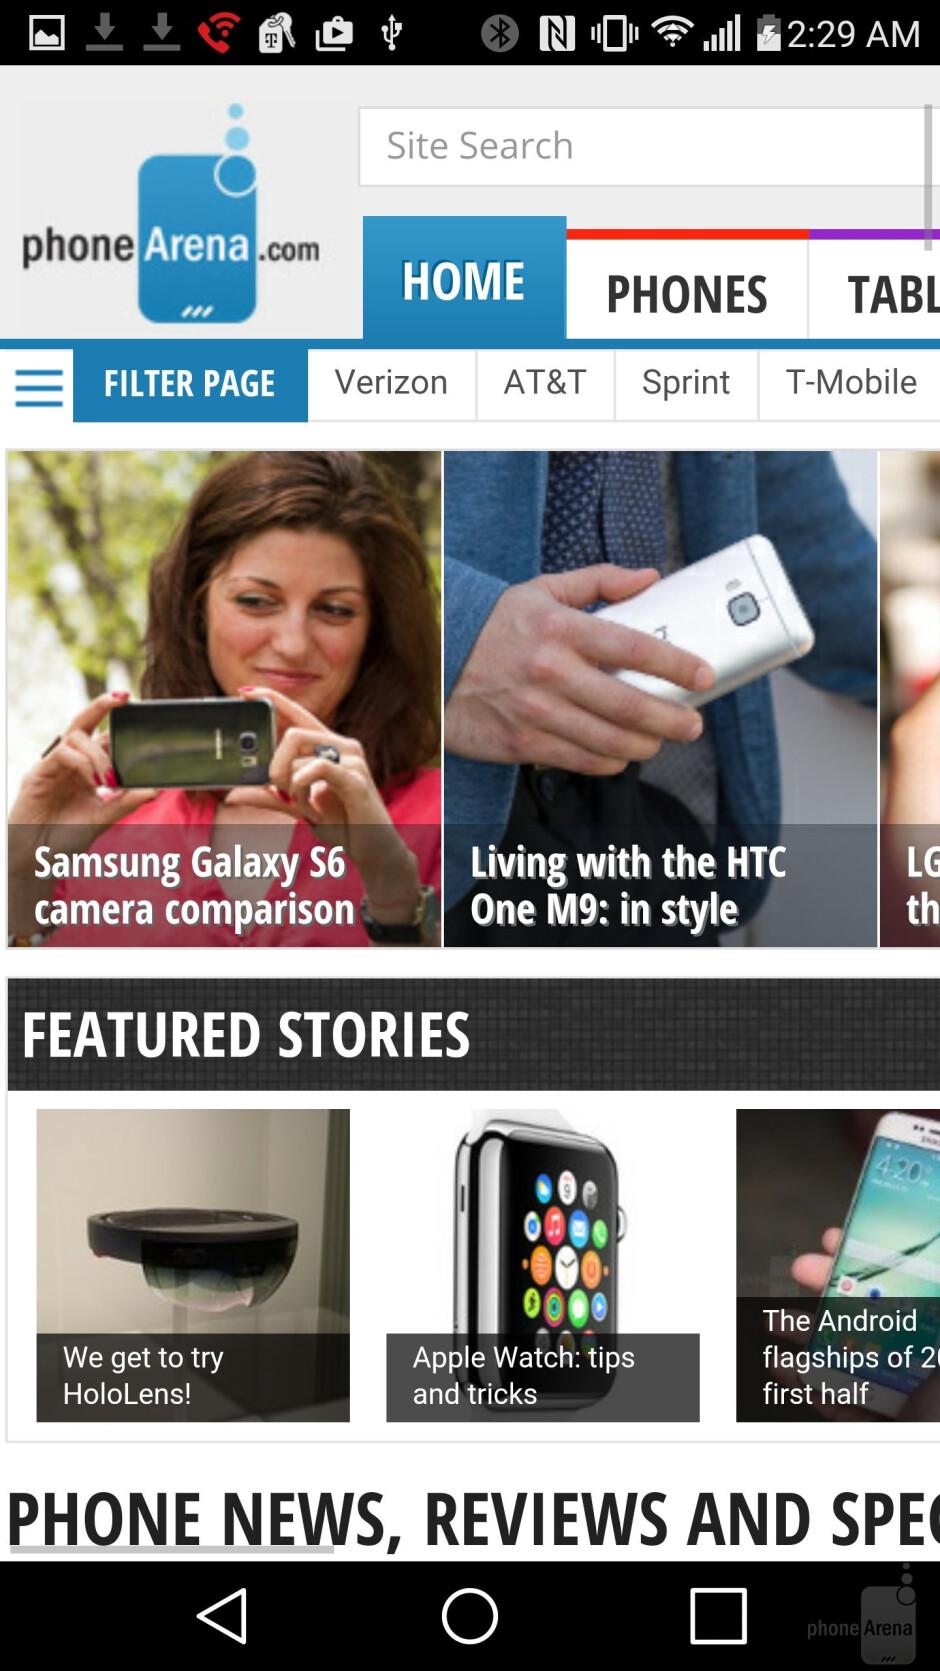 Internet browsing - LG G4 vs HTC One M9